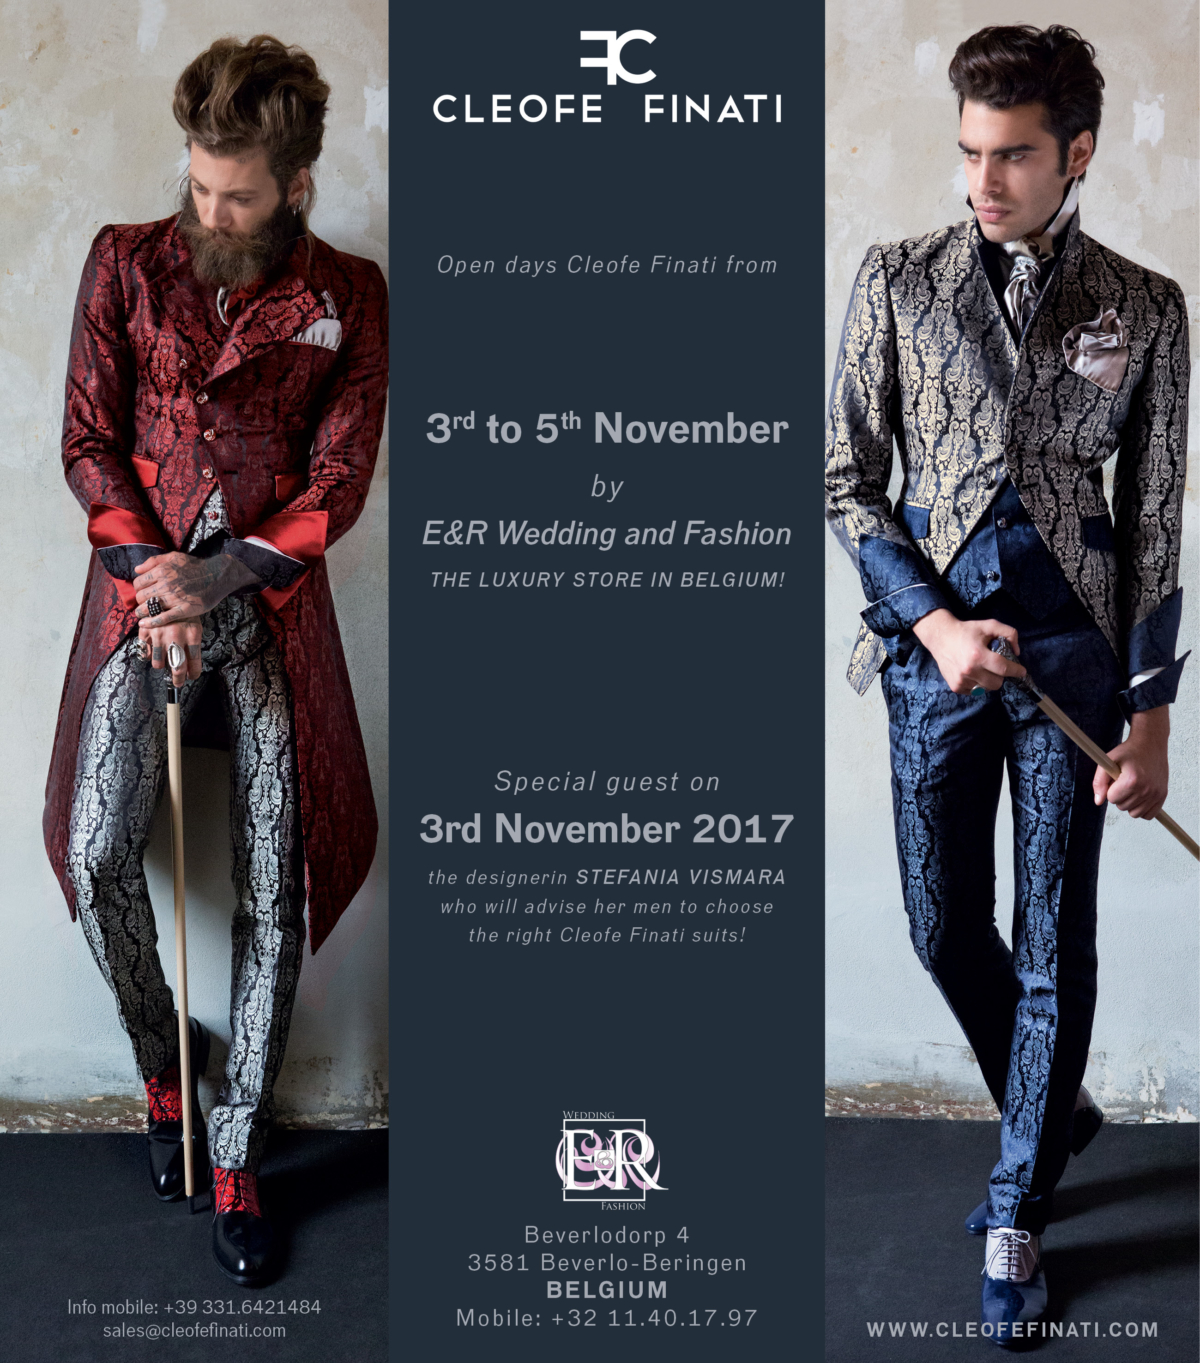 Workshop & Trunkshow by Cleofe Finati at E&R in Belgium